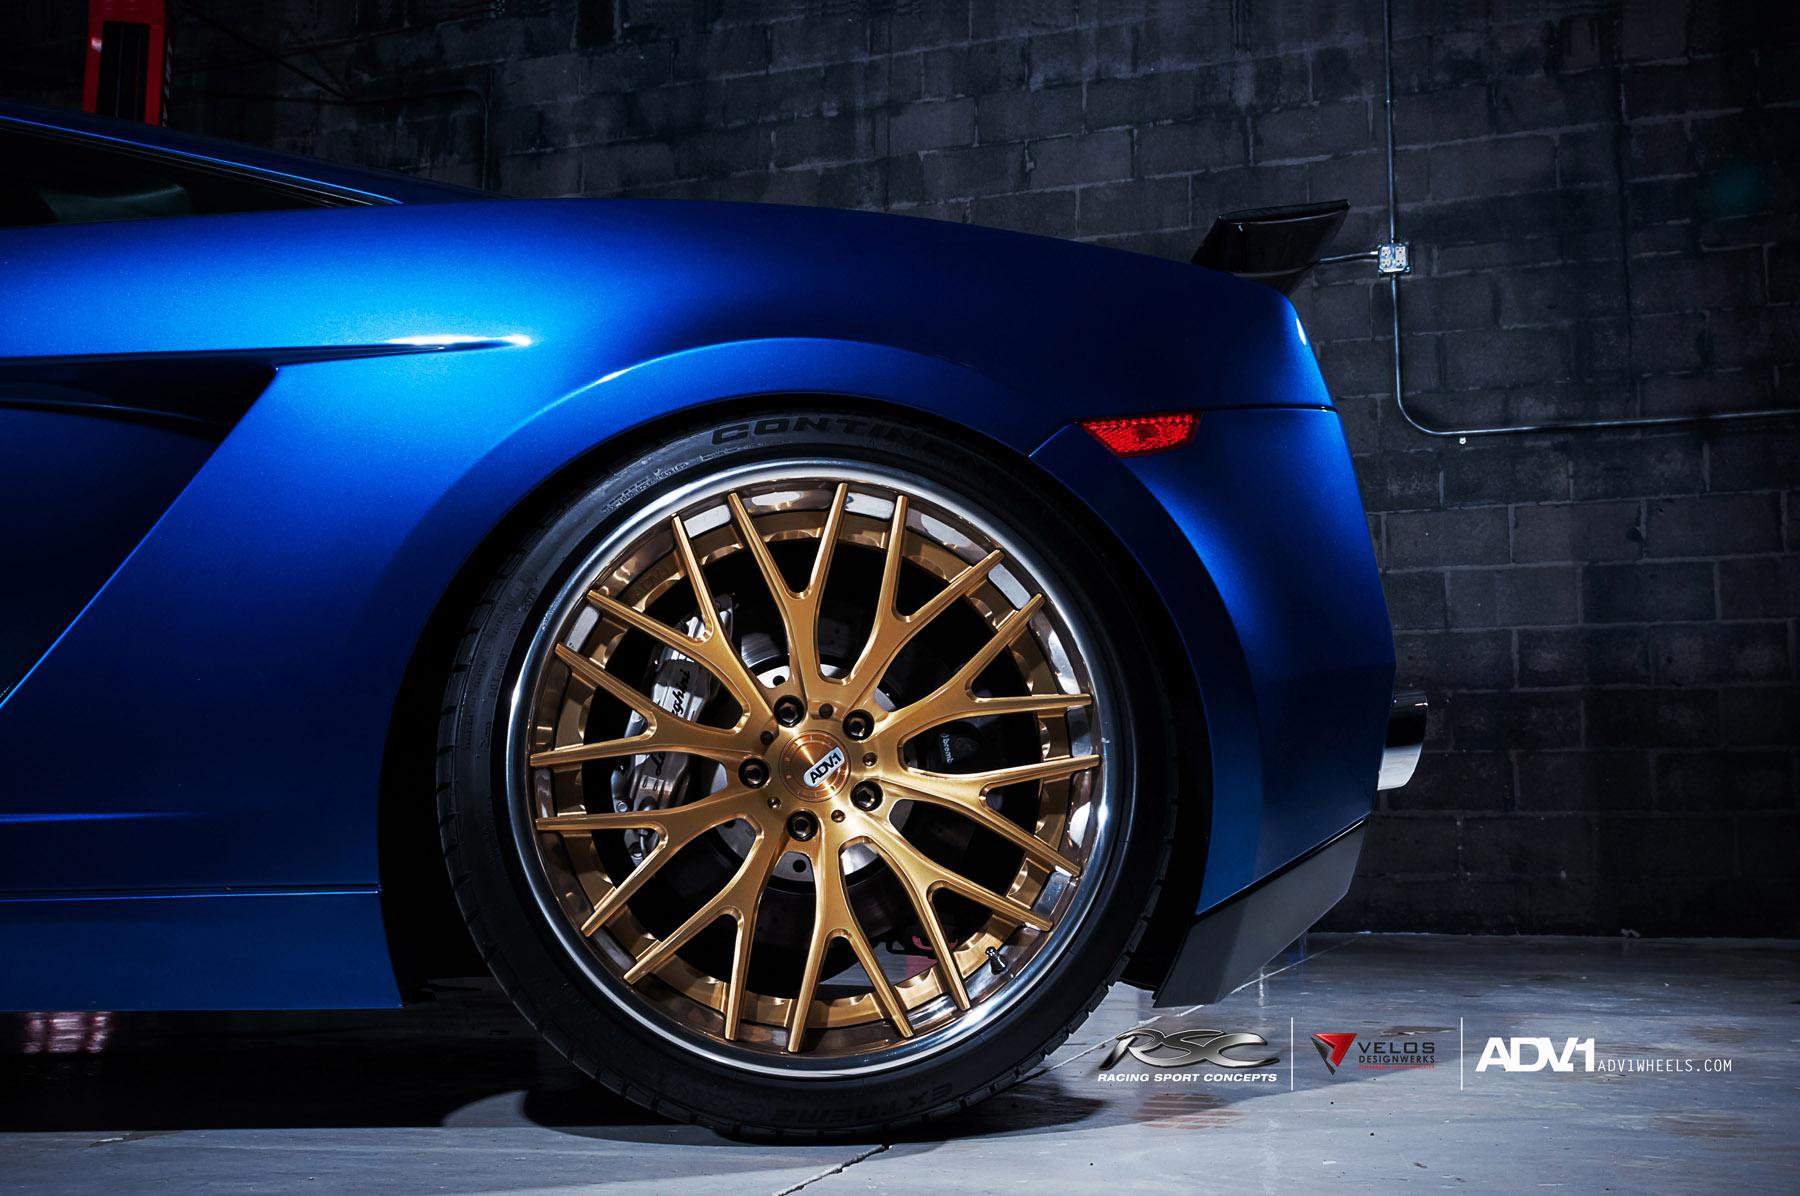 ADV.1 колеса Lamborghini Gallardo ADV10.0TS SL Gold Edition  - фотография №7